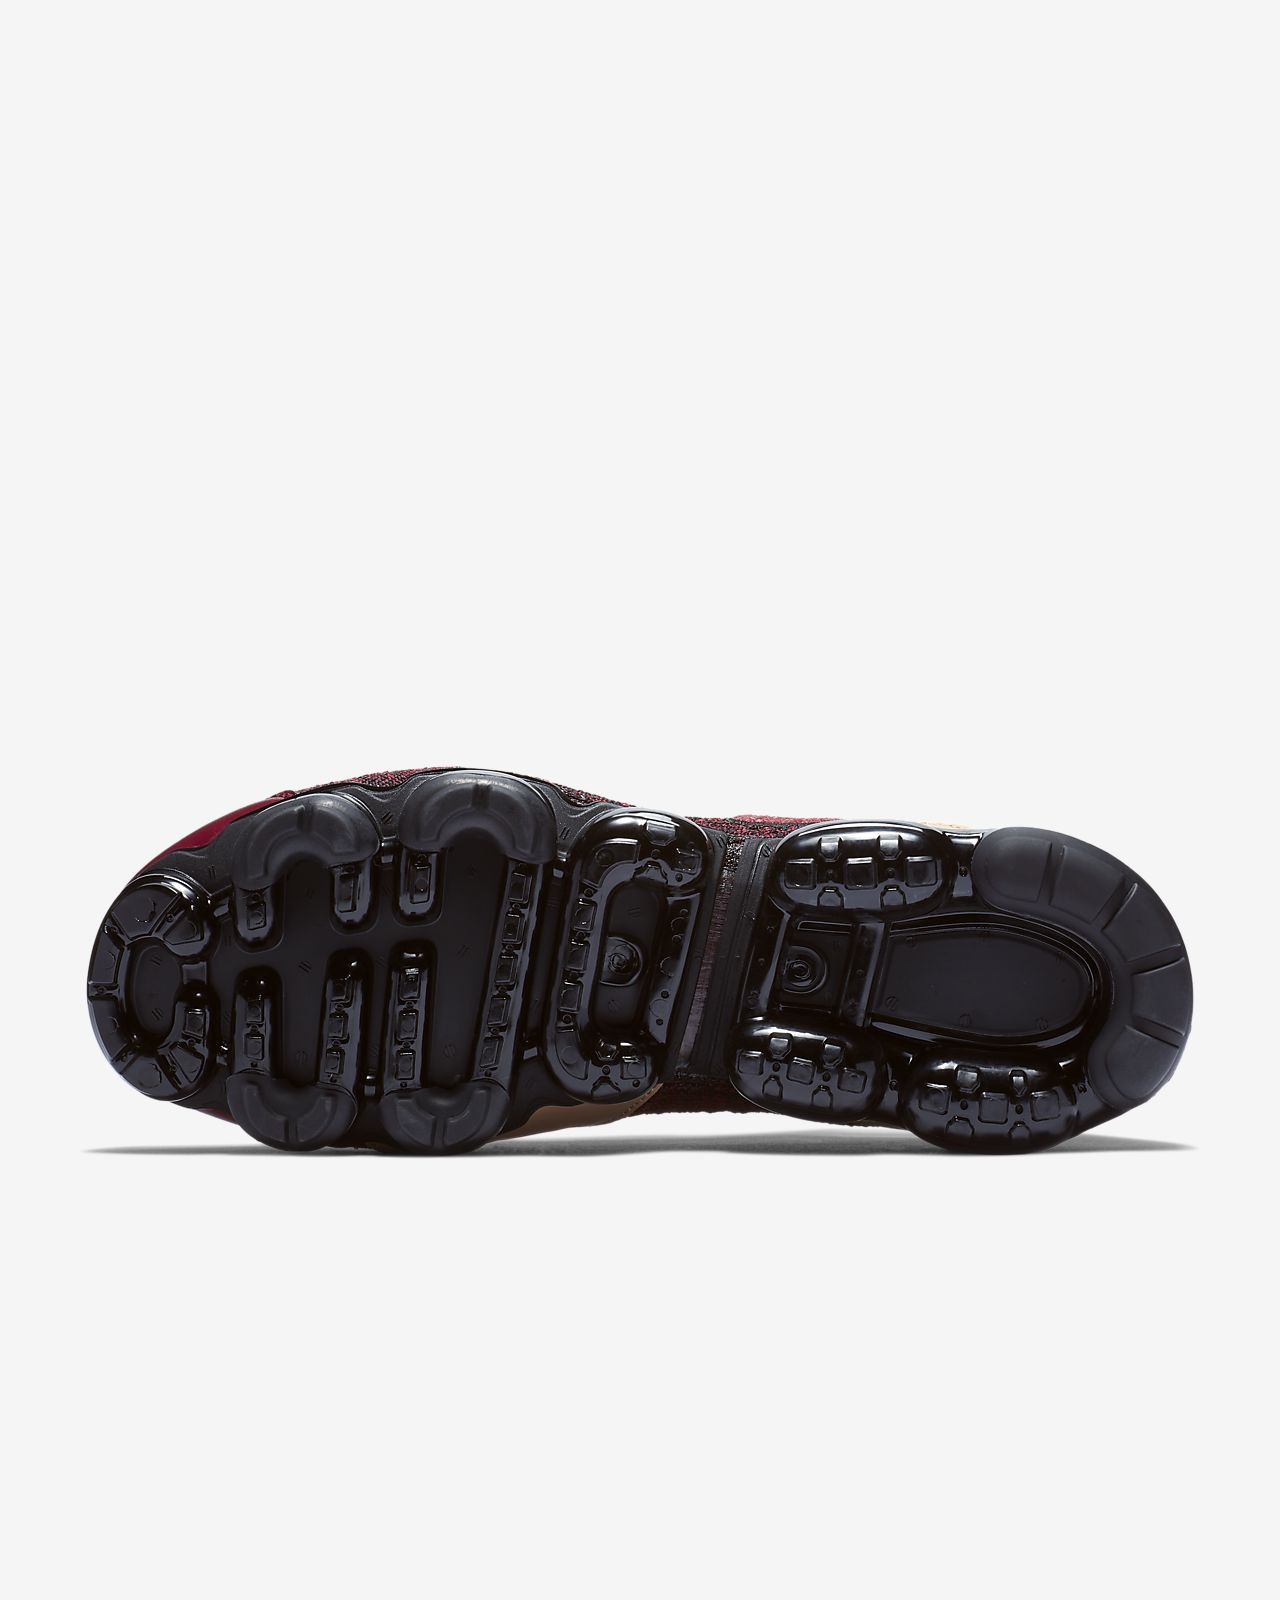 9ee64f7998b5e Nike Air VaporMax Flyknit 2 NRG Men s Shoe. Nike.com MY